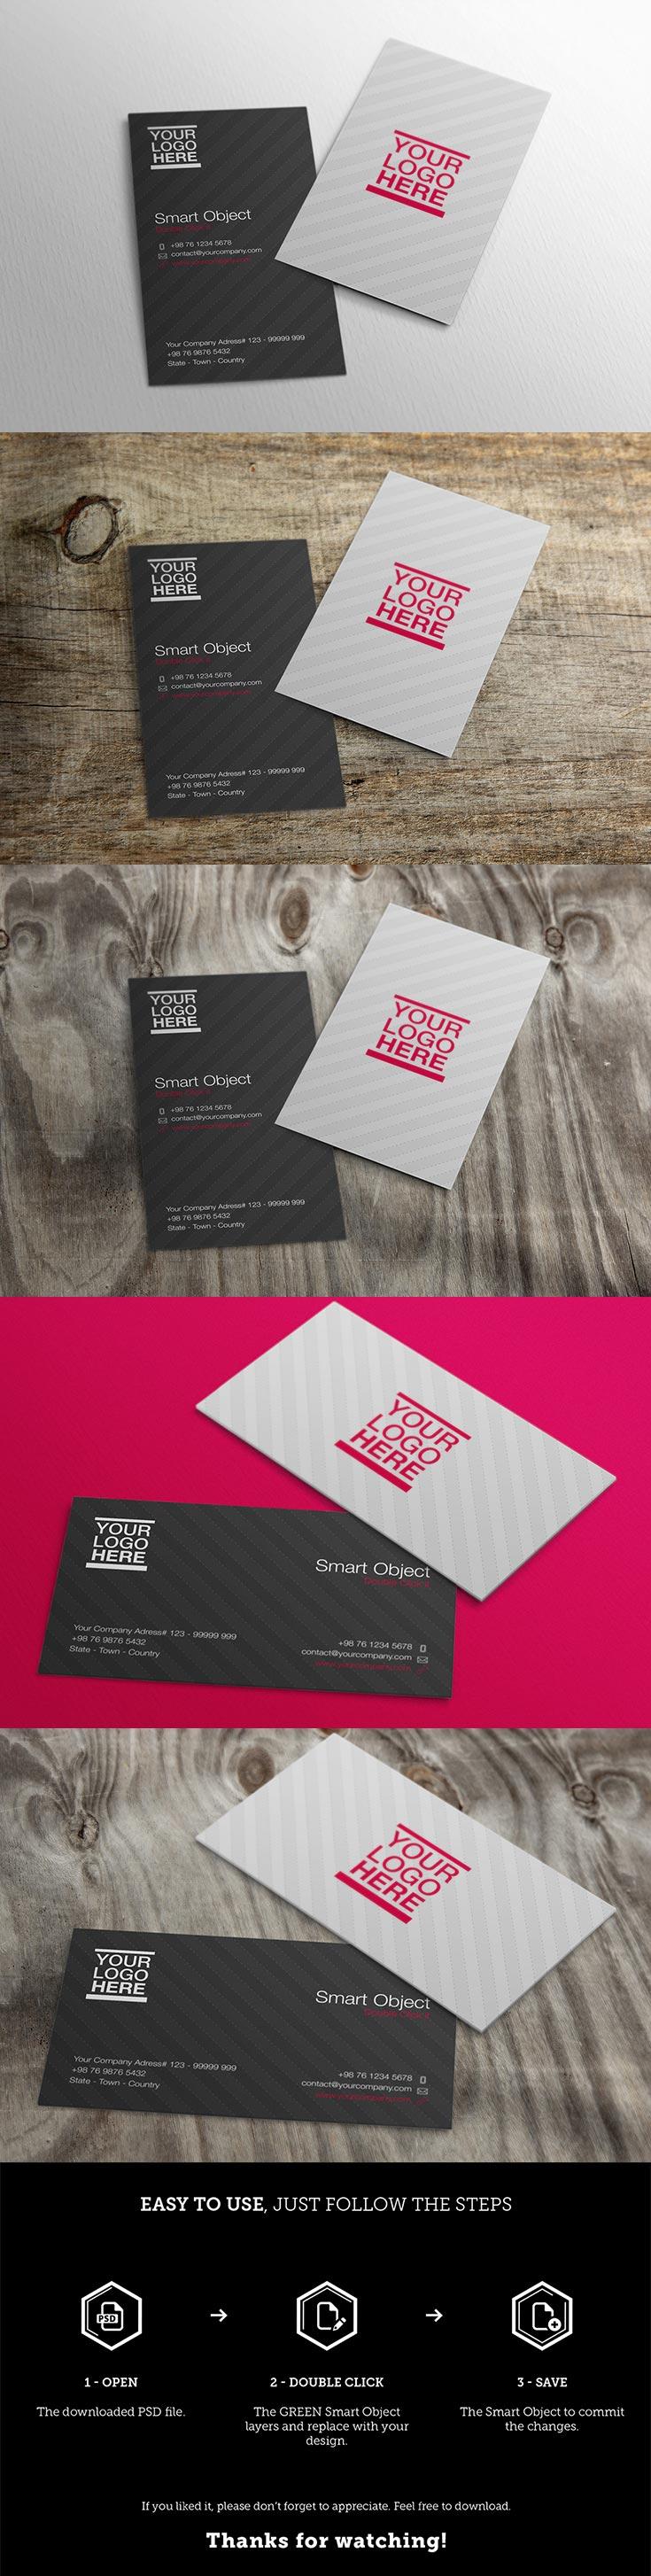 free business cards mockups vol 2 — creativetacos